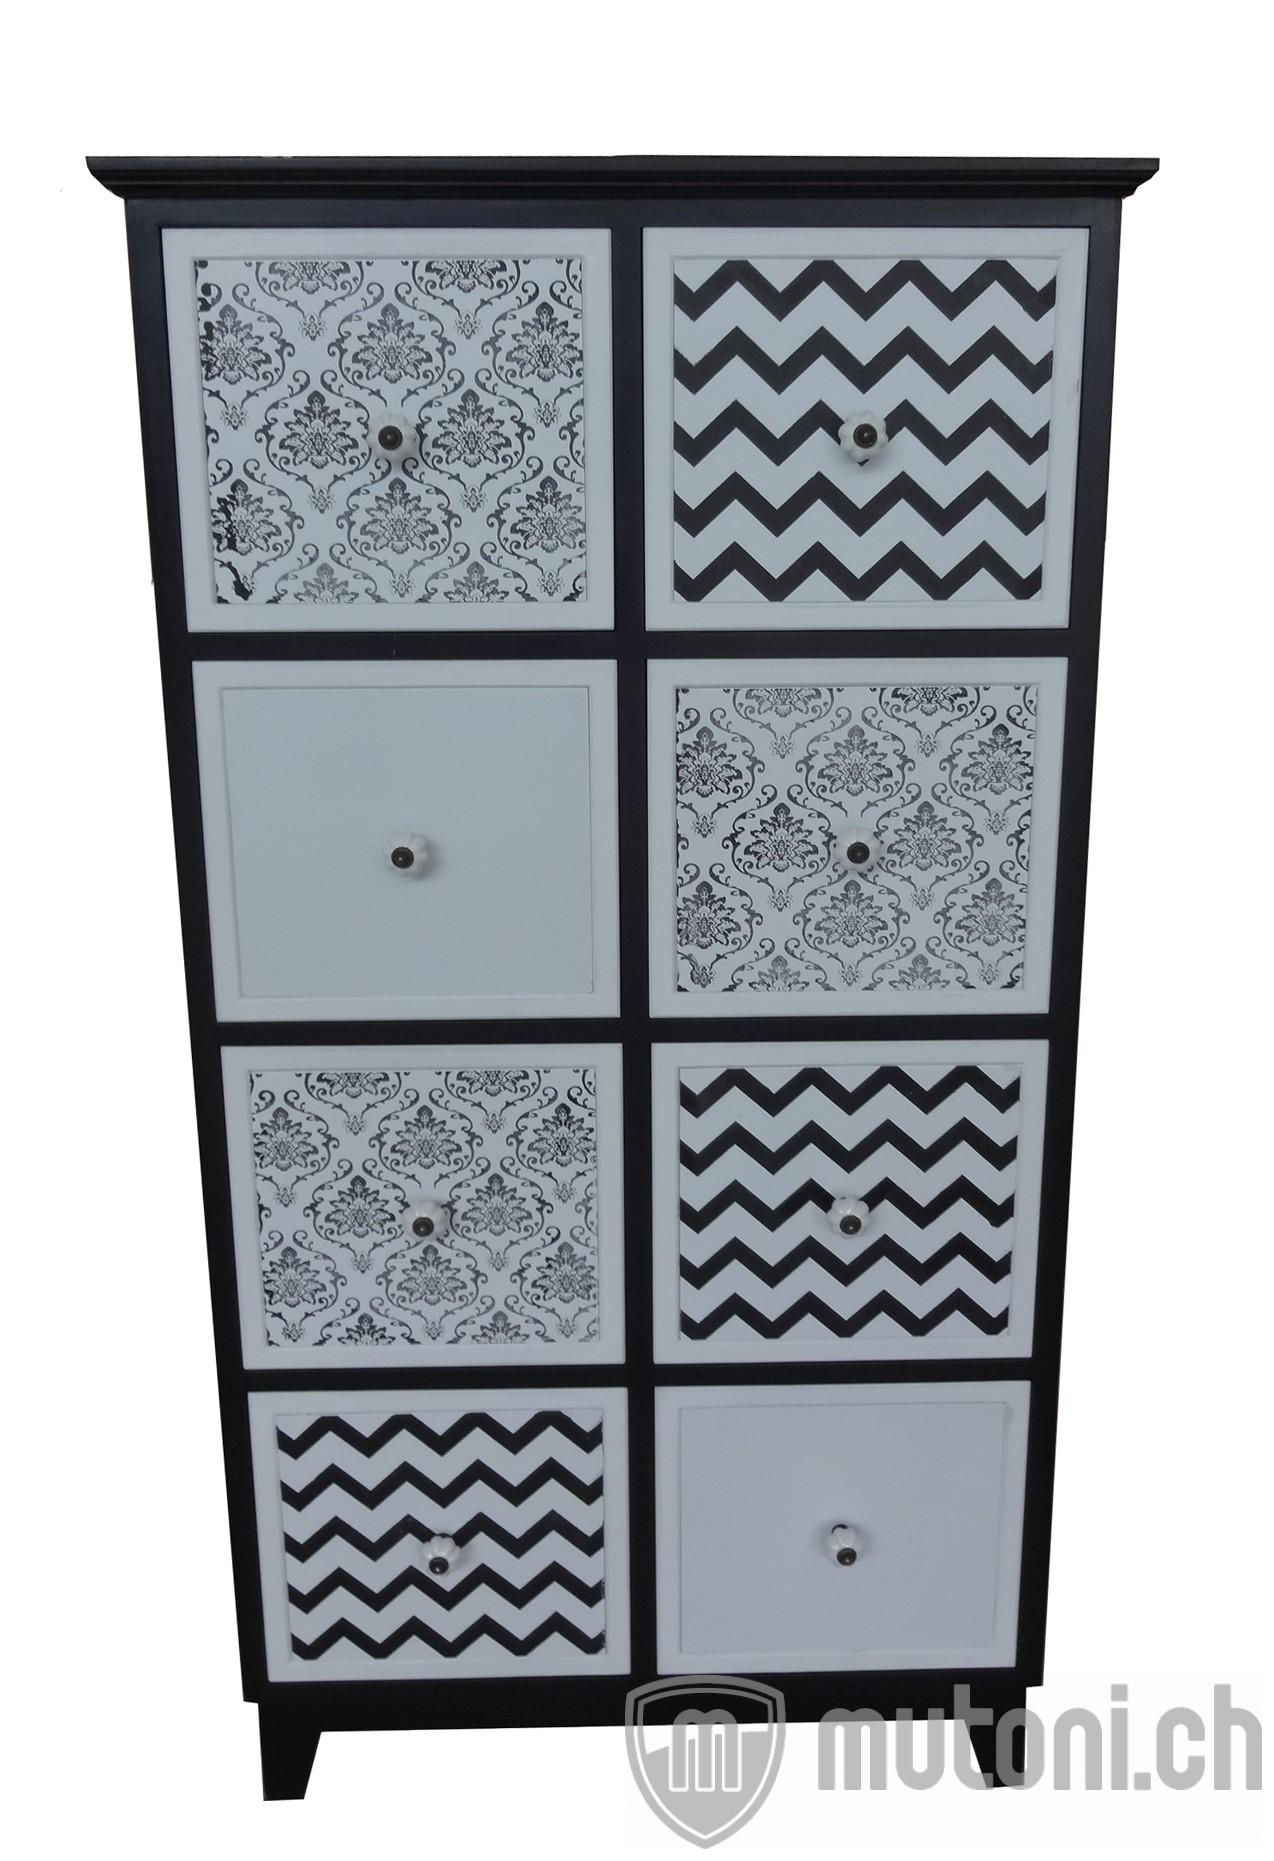 kommode seashell schwarz weiss kommoden kommoden sideboards wohnzimmer m bel mutoni. Black Bedroom Furniture Sets. Home Design Ideas